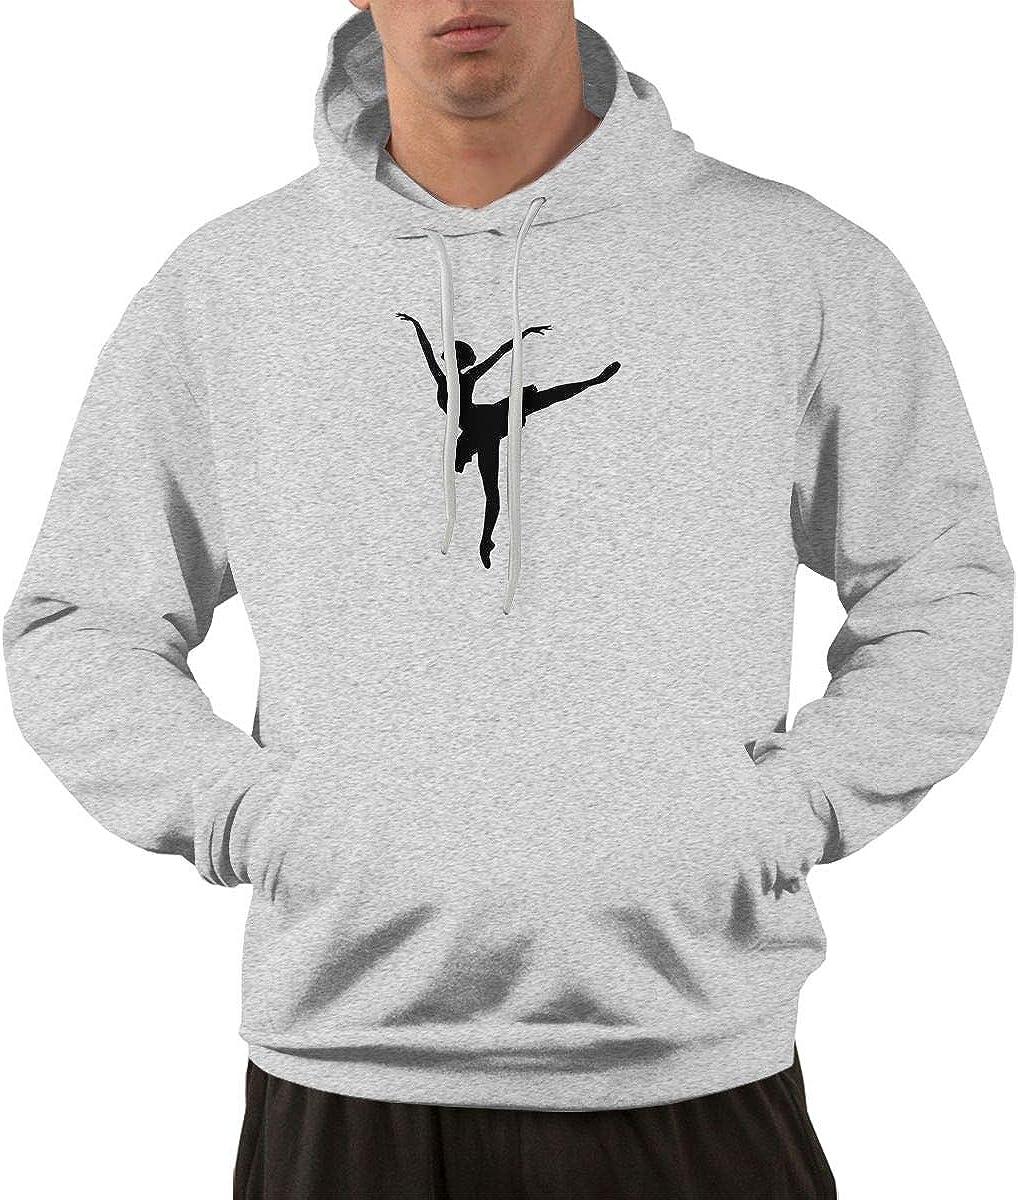 Iponvx Ballerina Hoodie Mens Performance Active Hooded Sweatshirt